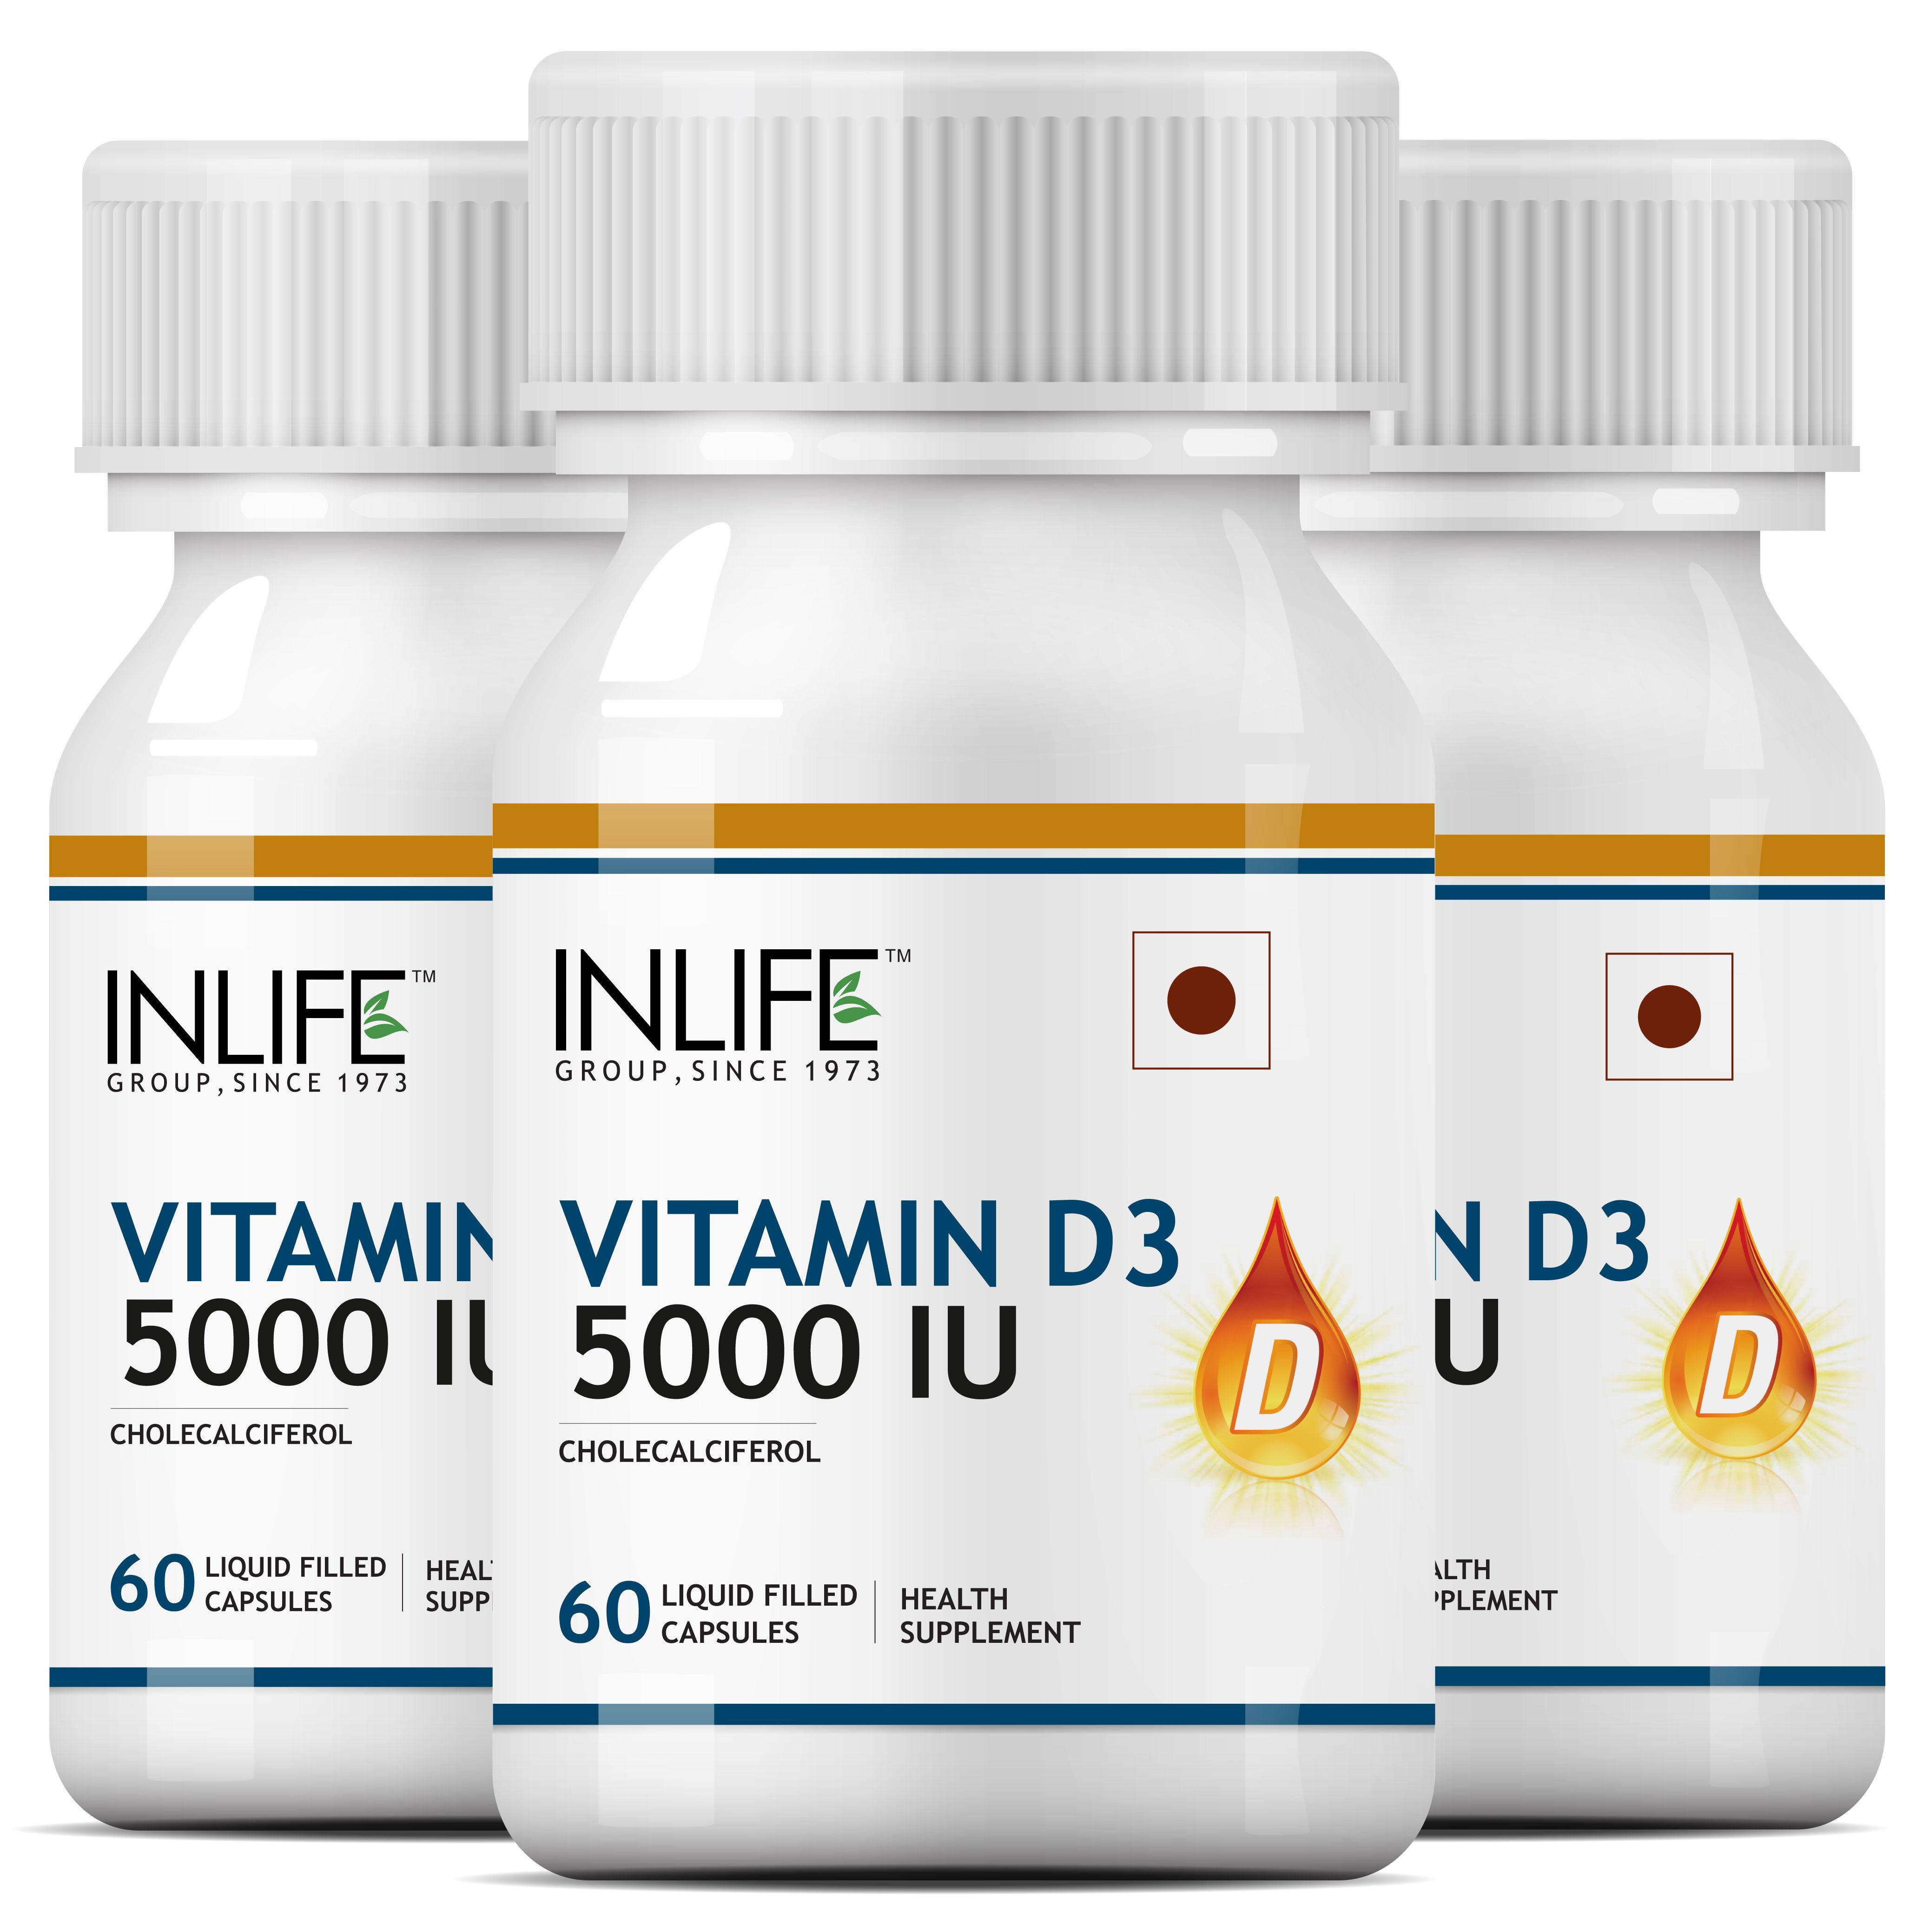 INLIFE Vitamin D3 Cholecalciferol 5000 IU Supplement Pack Of 3